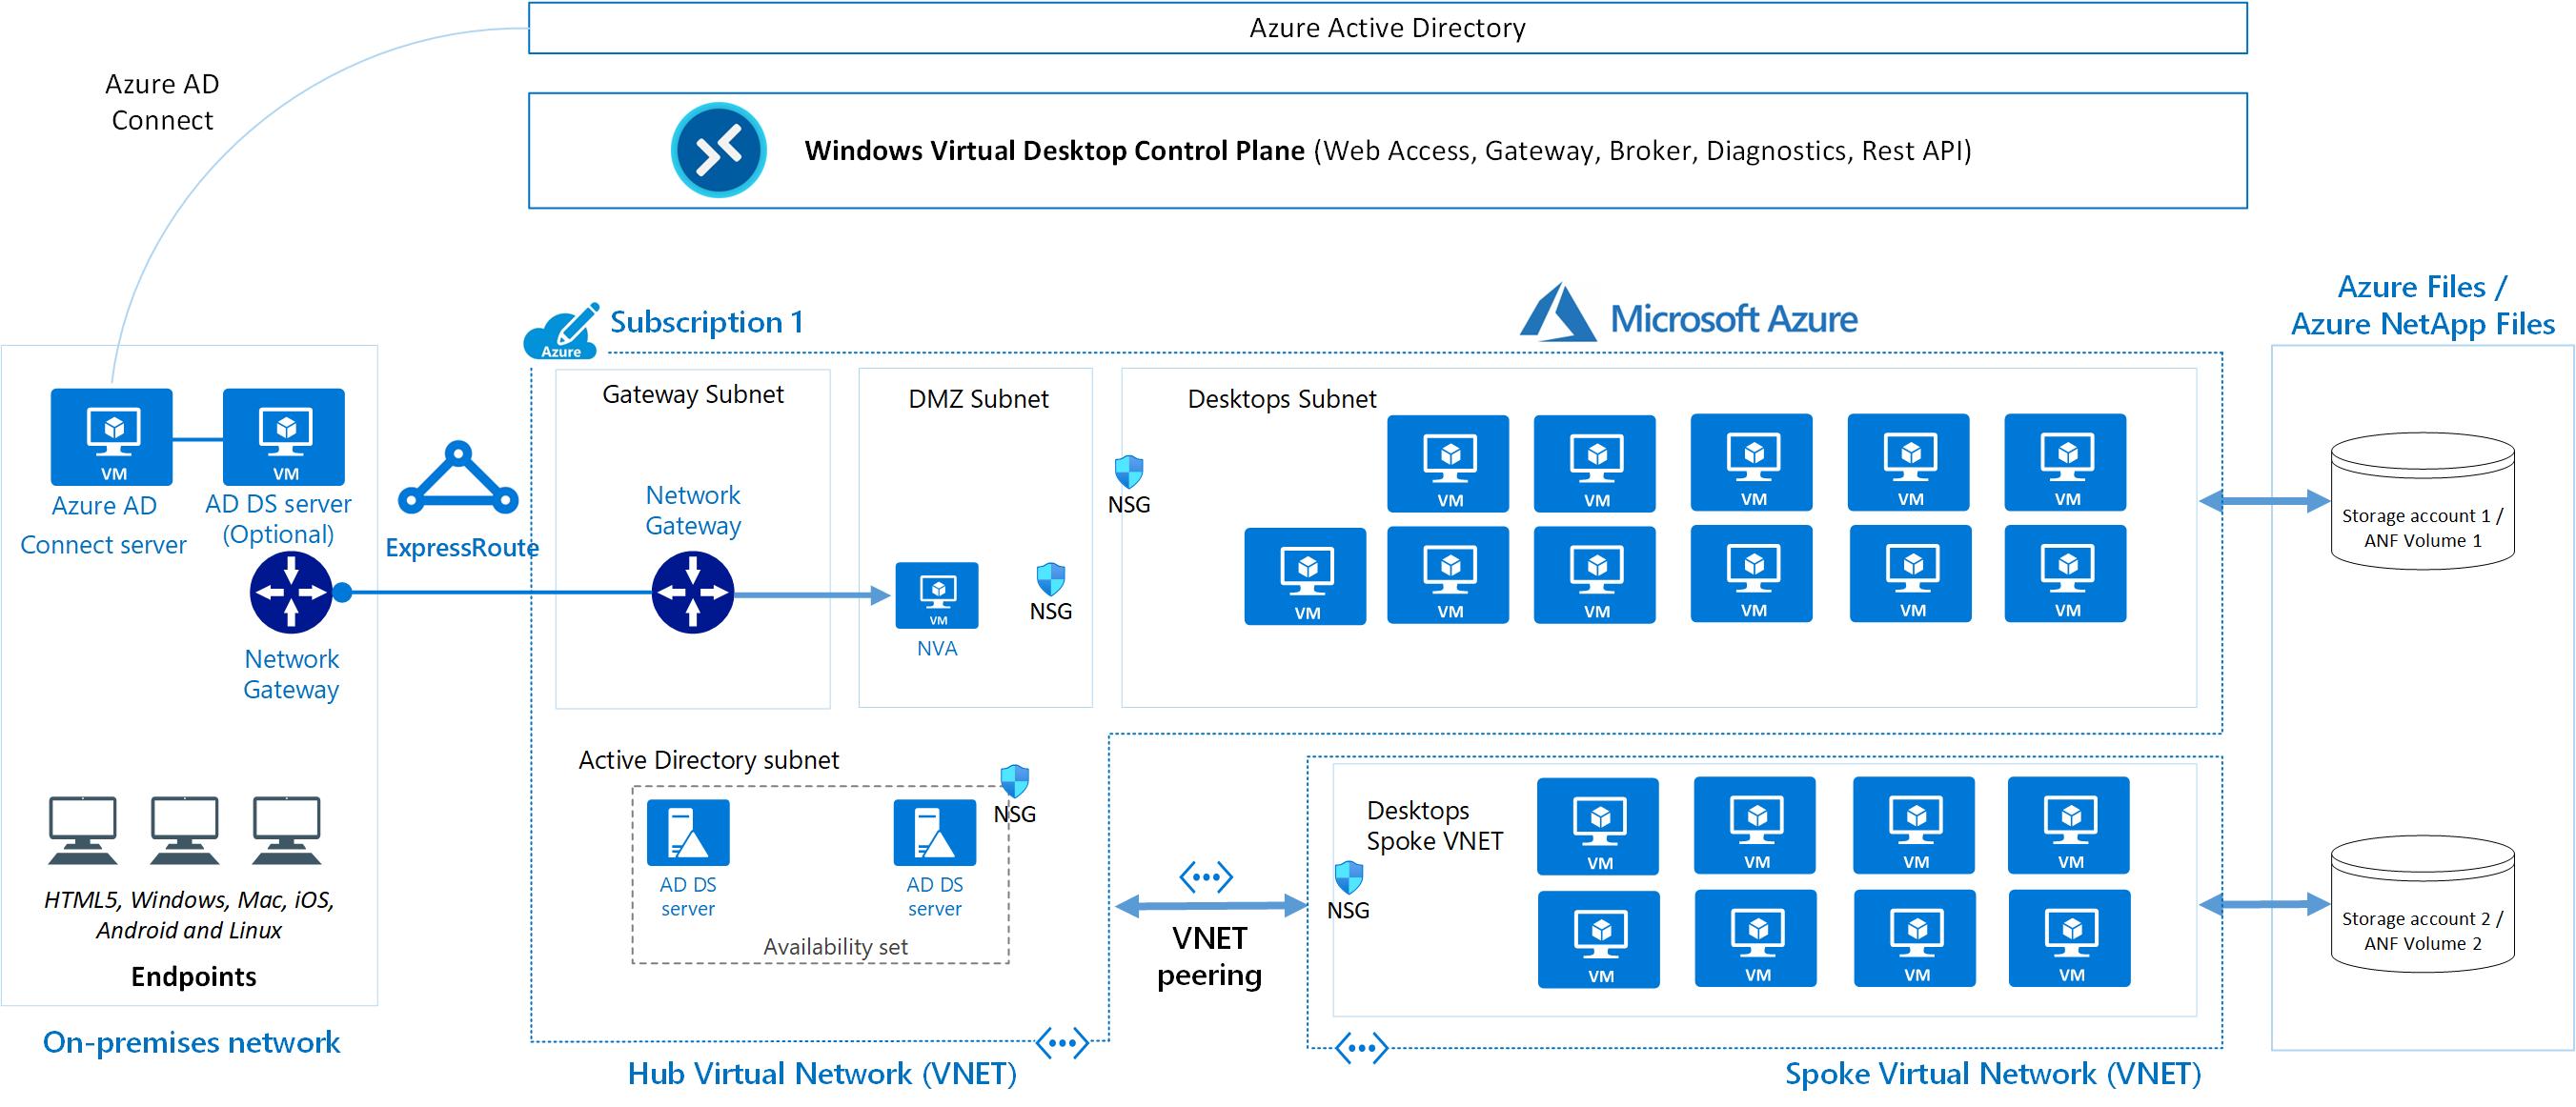 Windows Virtual Desktop pour les entreprises - Azure Example Scenarios |  Microsoft Docs